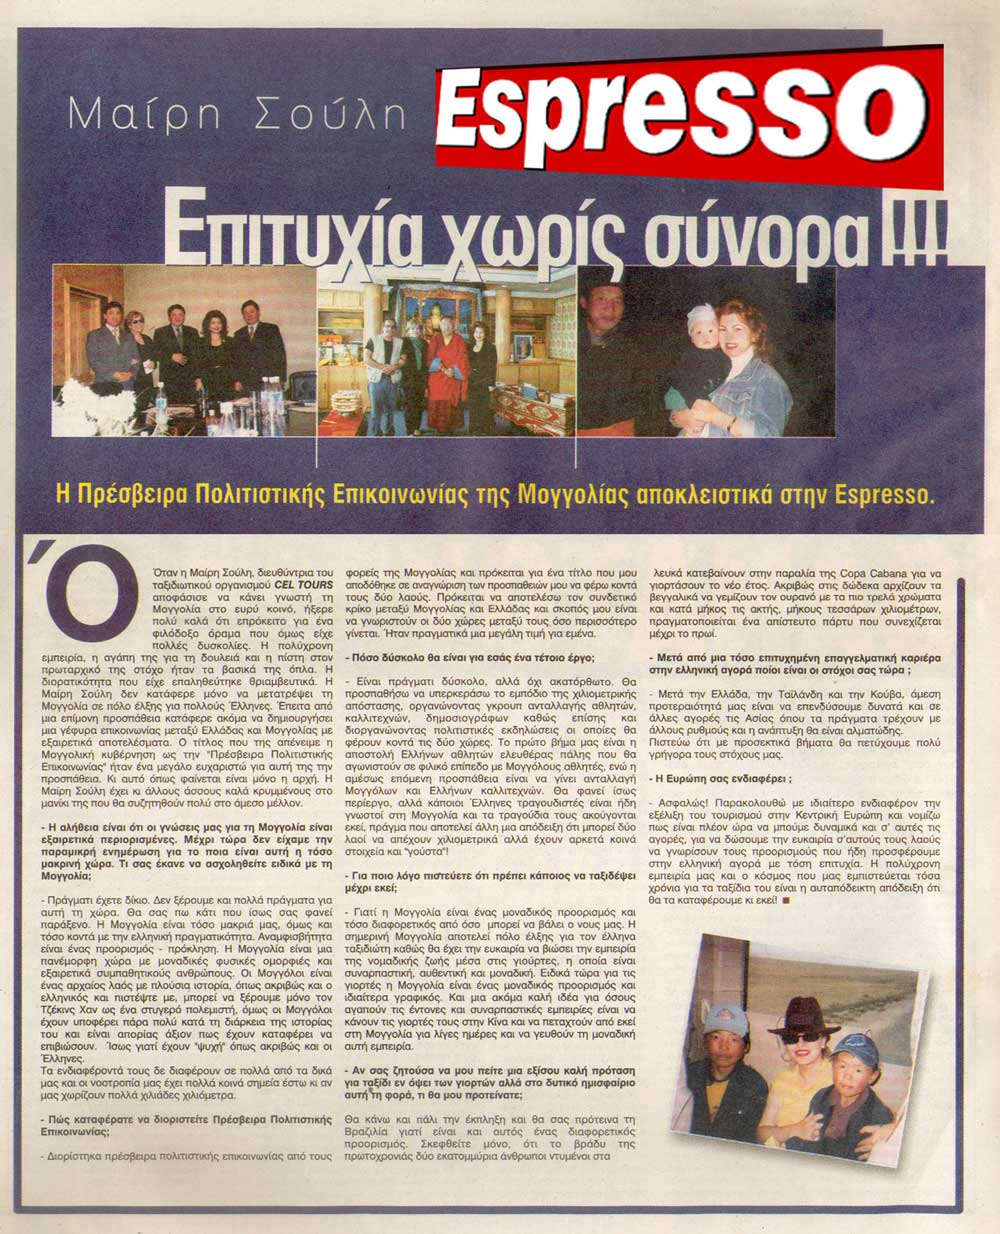 mme_esspreso_news